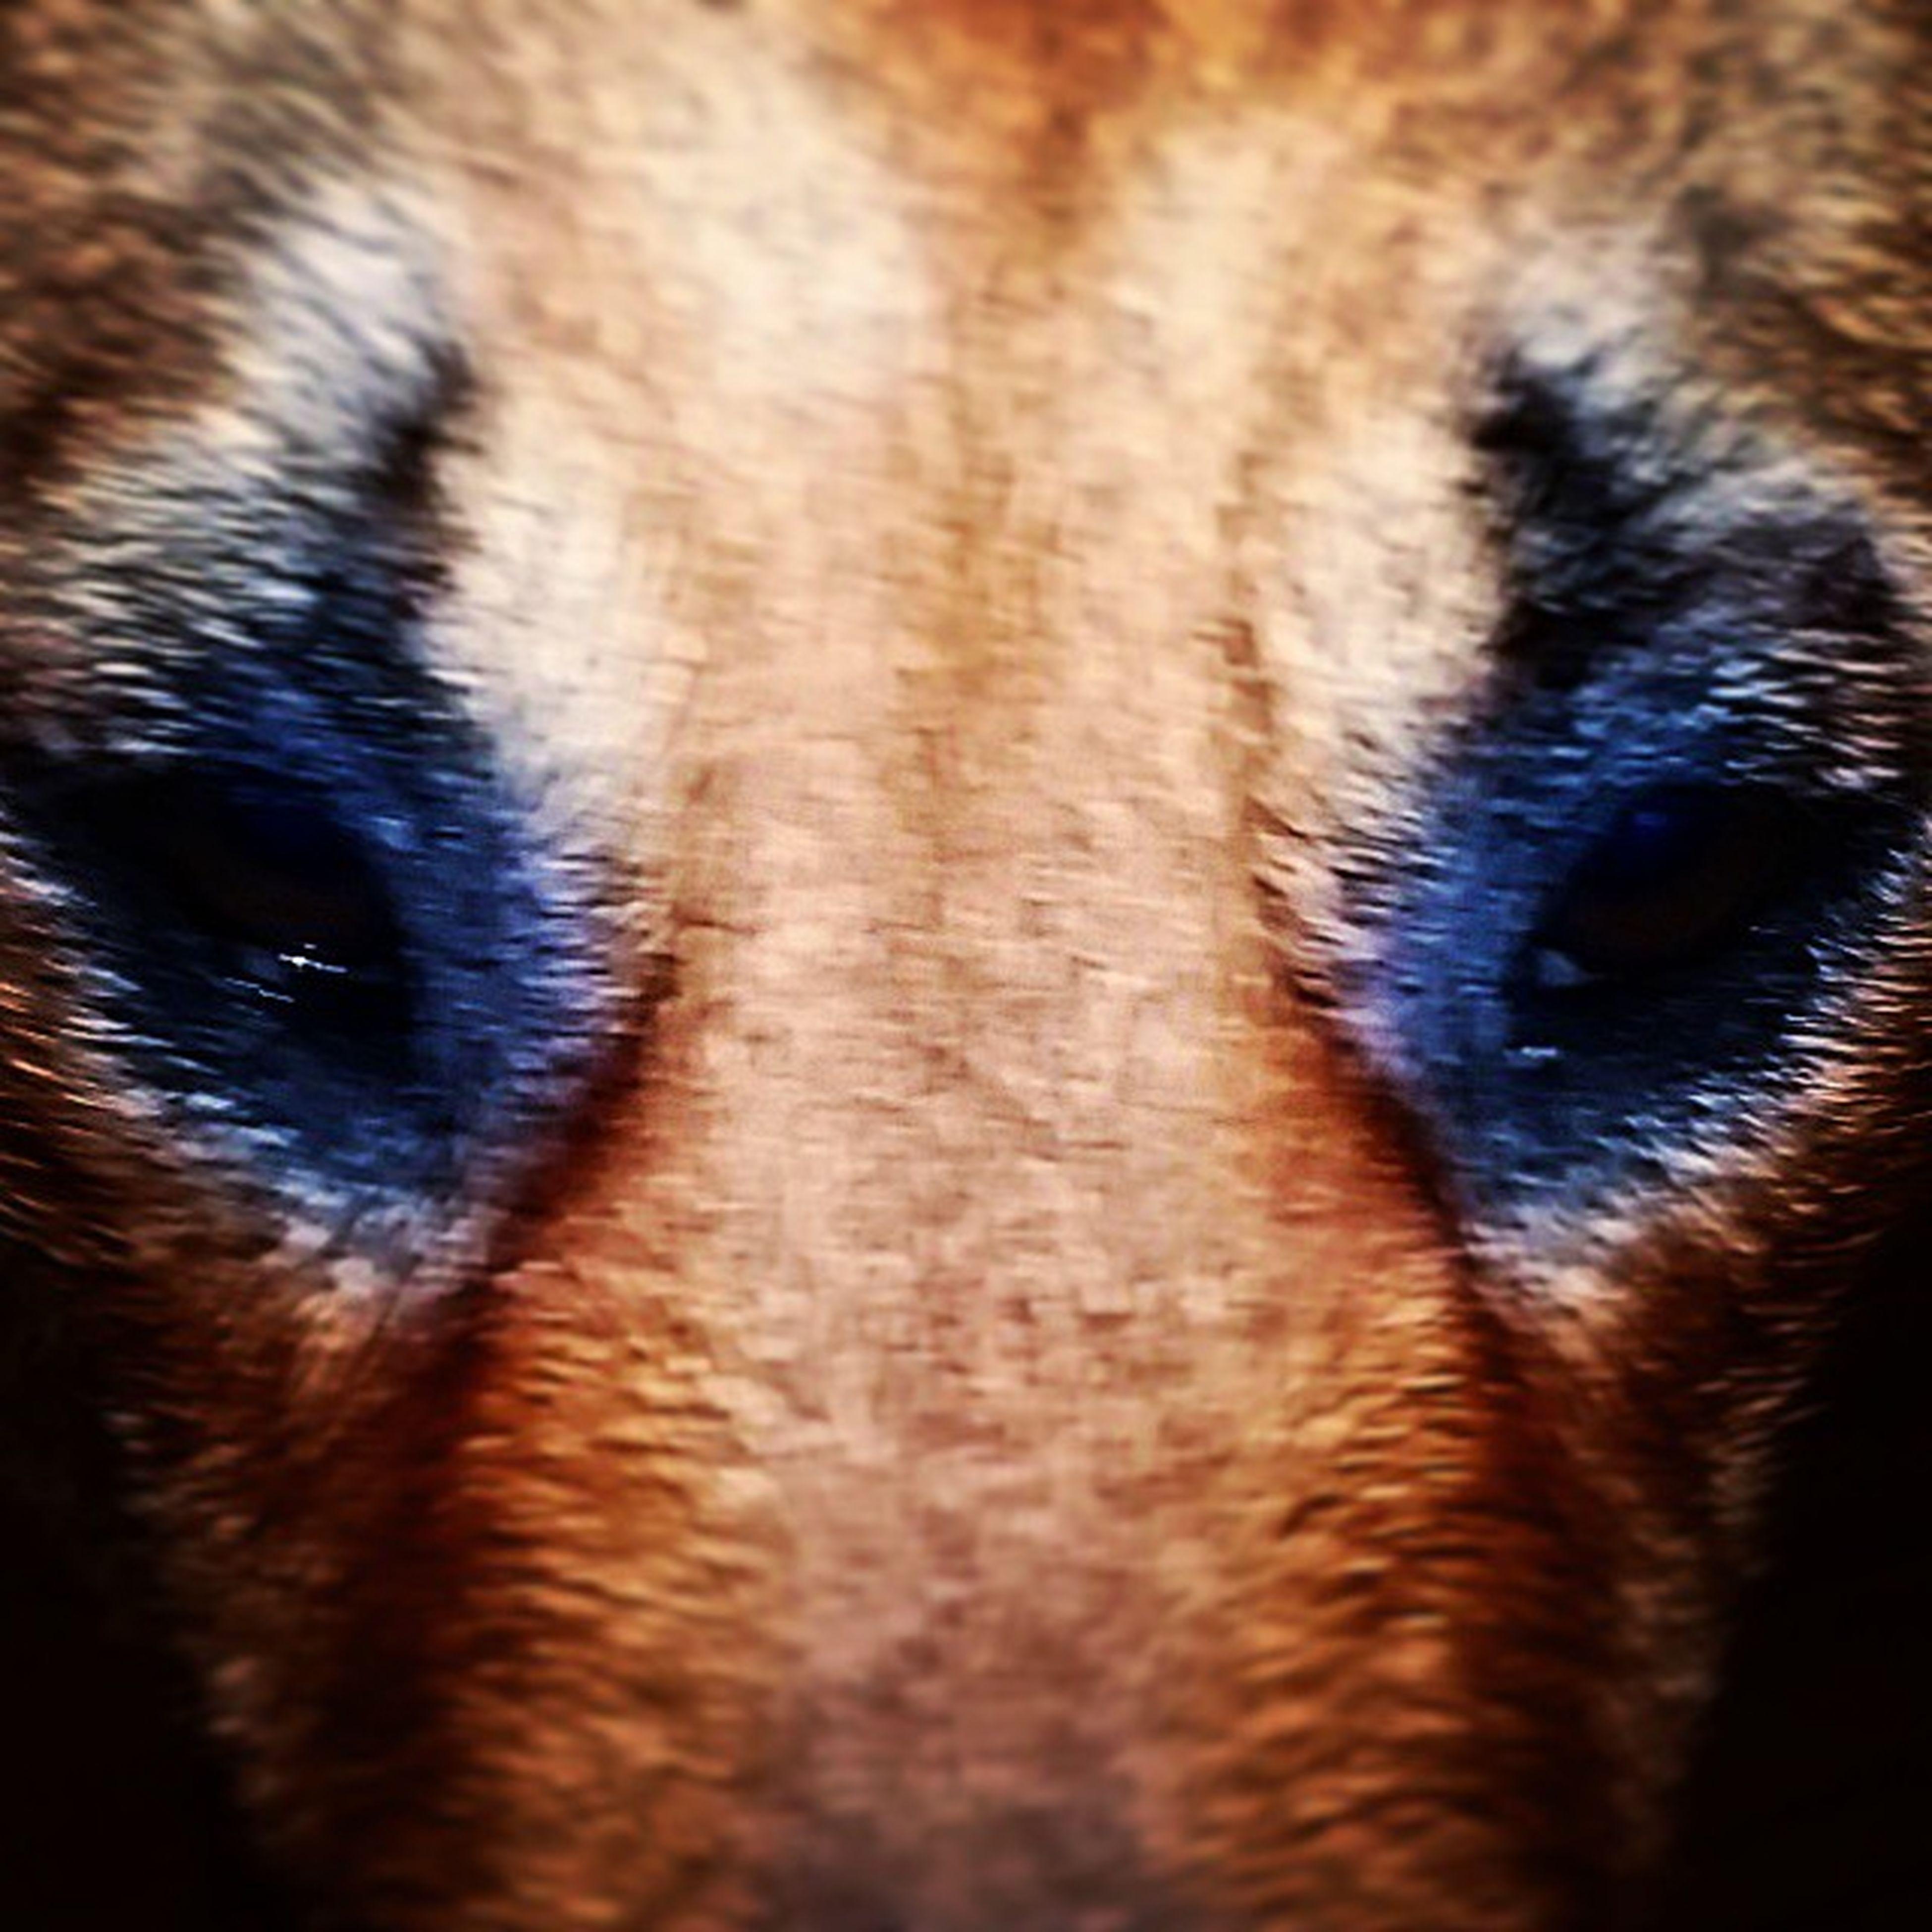 animal themes, one animal, animal body part, animal head, close-up, part of, domestic animals, animal eye, mammal, full frame, extreme close up, backgrounds, wildlife, detail, animal nose, extreme close-up, pets, cropped, horse, animal hair